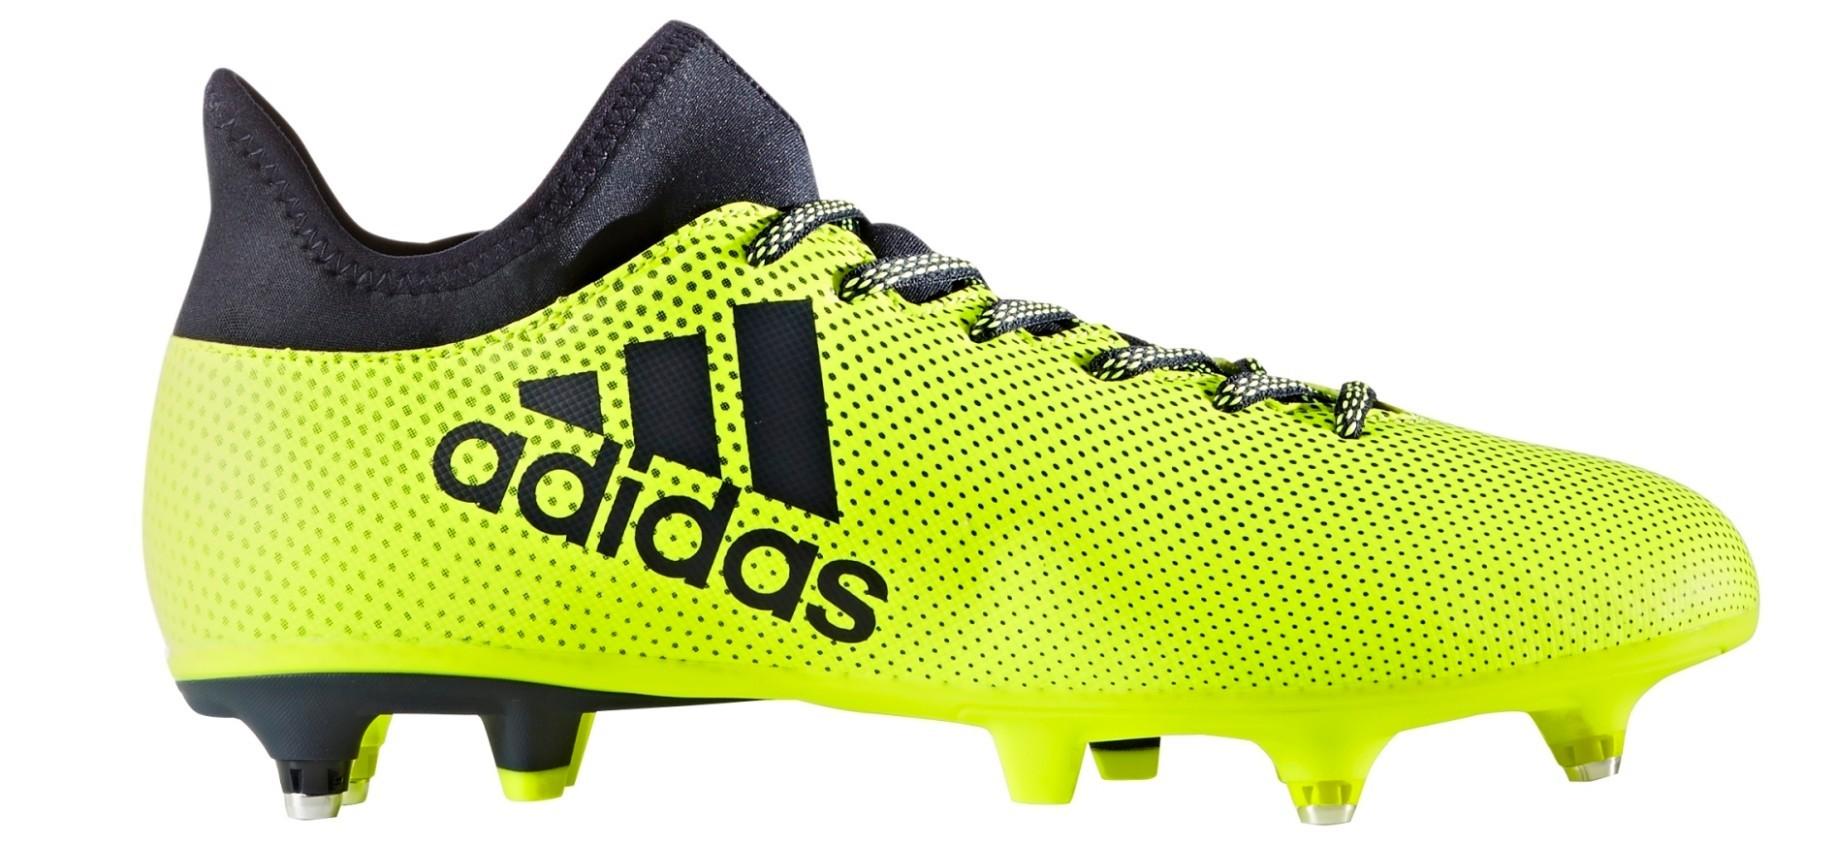 Sg Pack Colore Storm X Adidas Ocean Scarpe 3 17 Calcio Giallo q7xHRx8Xw